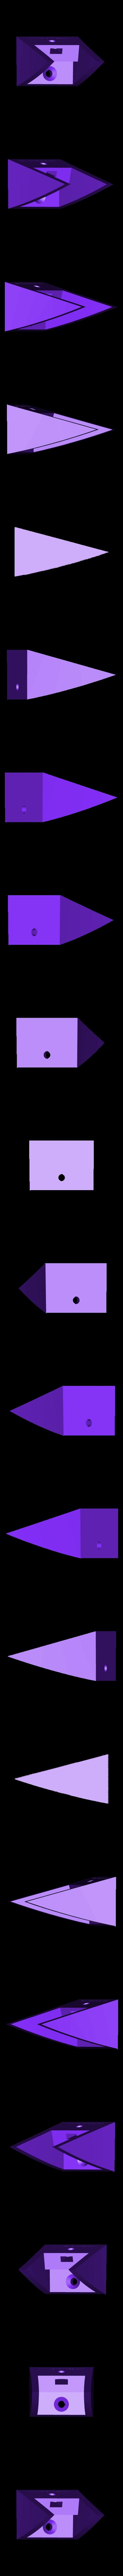 OpenRC_2017_MCL_Nose_Color1.stl Download free STL file OpenRC F1 Dual Color McLaren Edition • 3D printer model, DanielNoree